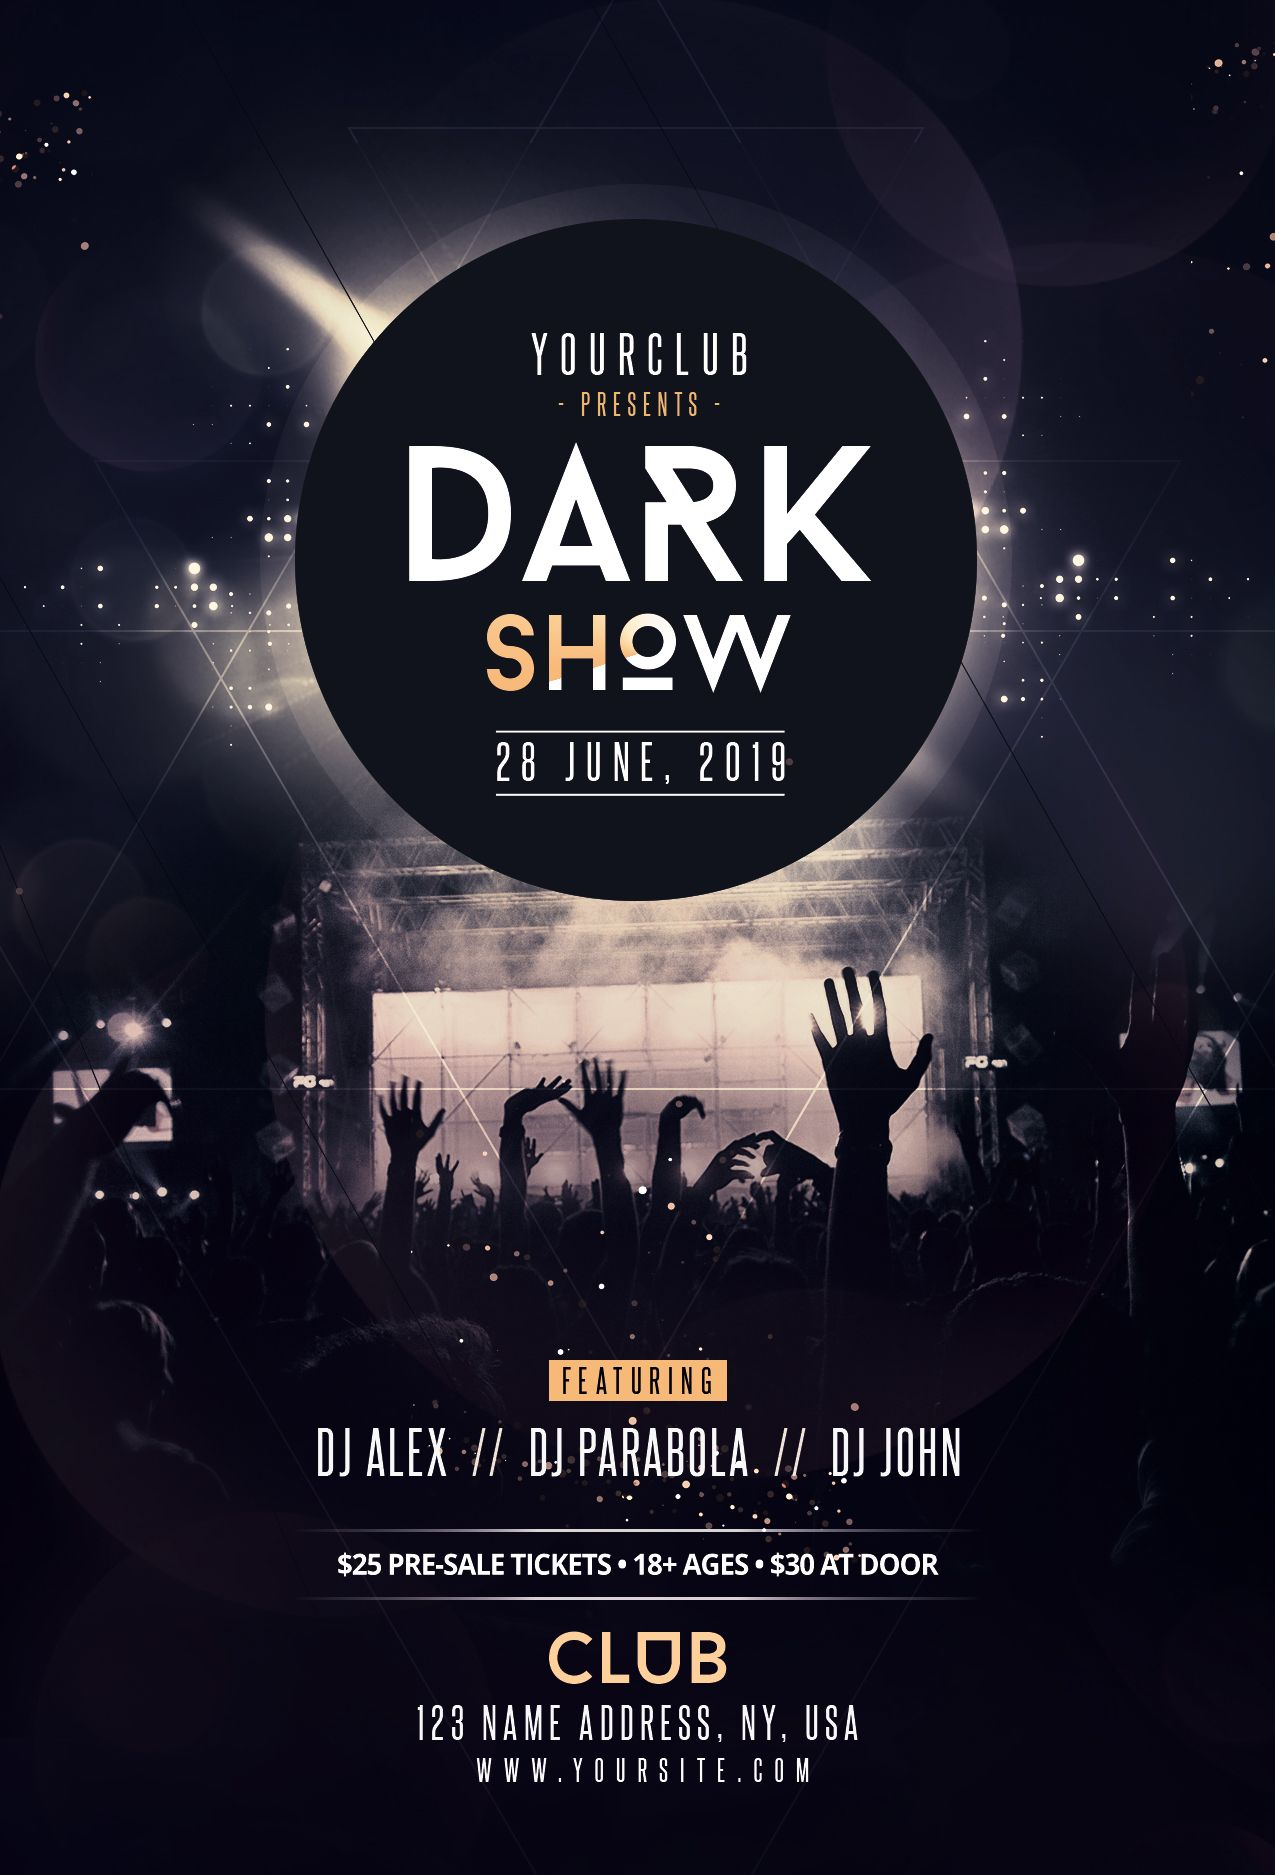 dark show free psd flyer template download design pinterest